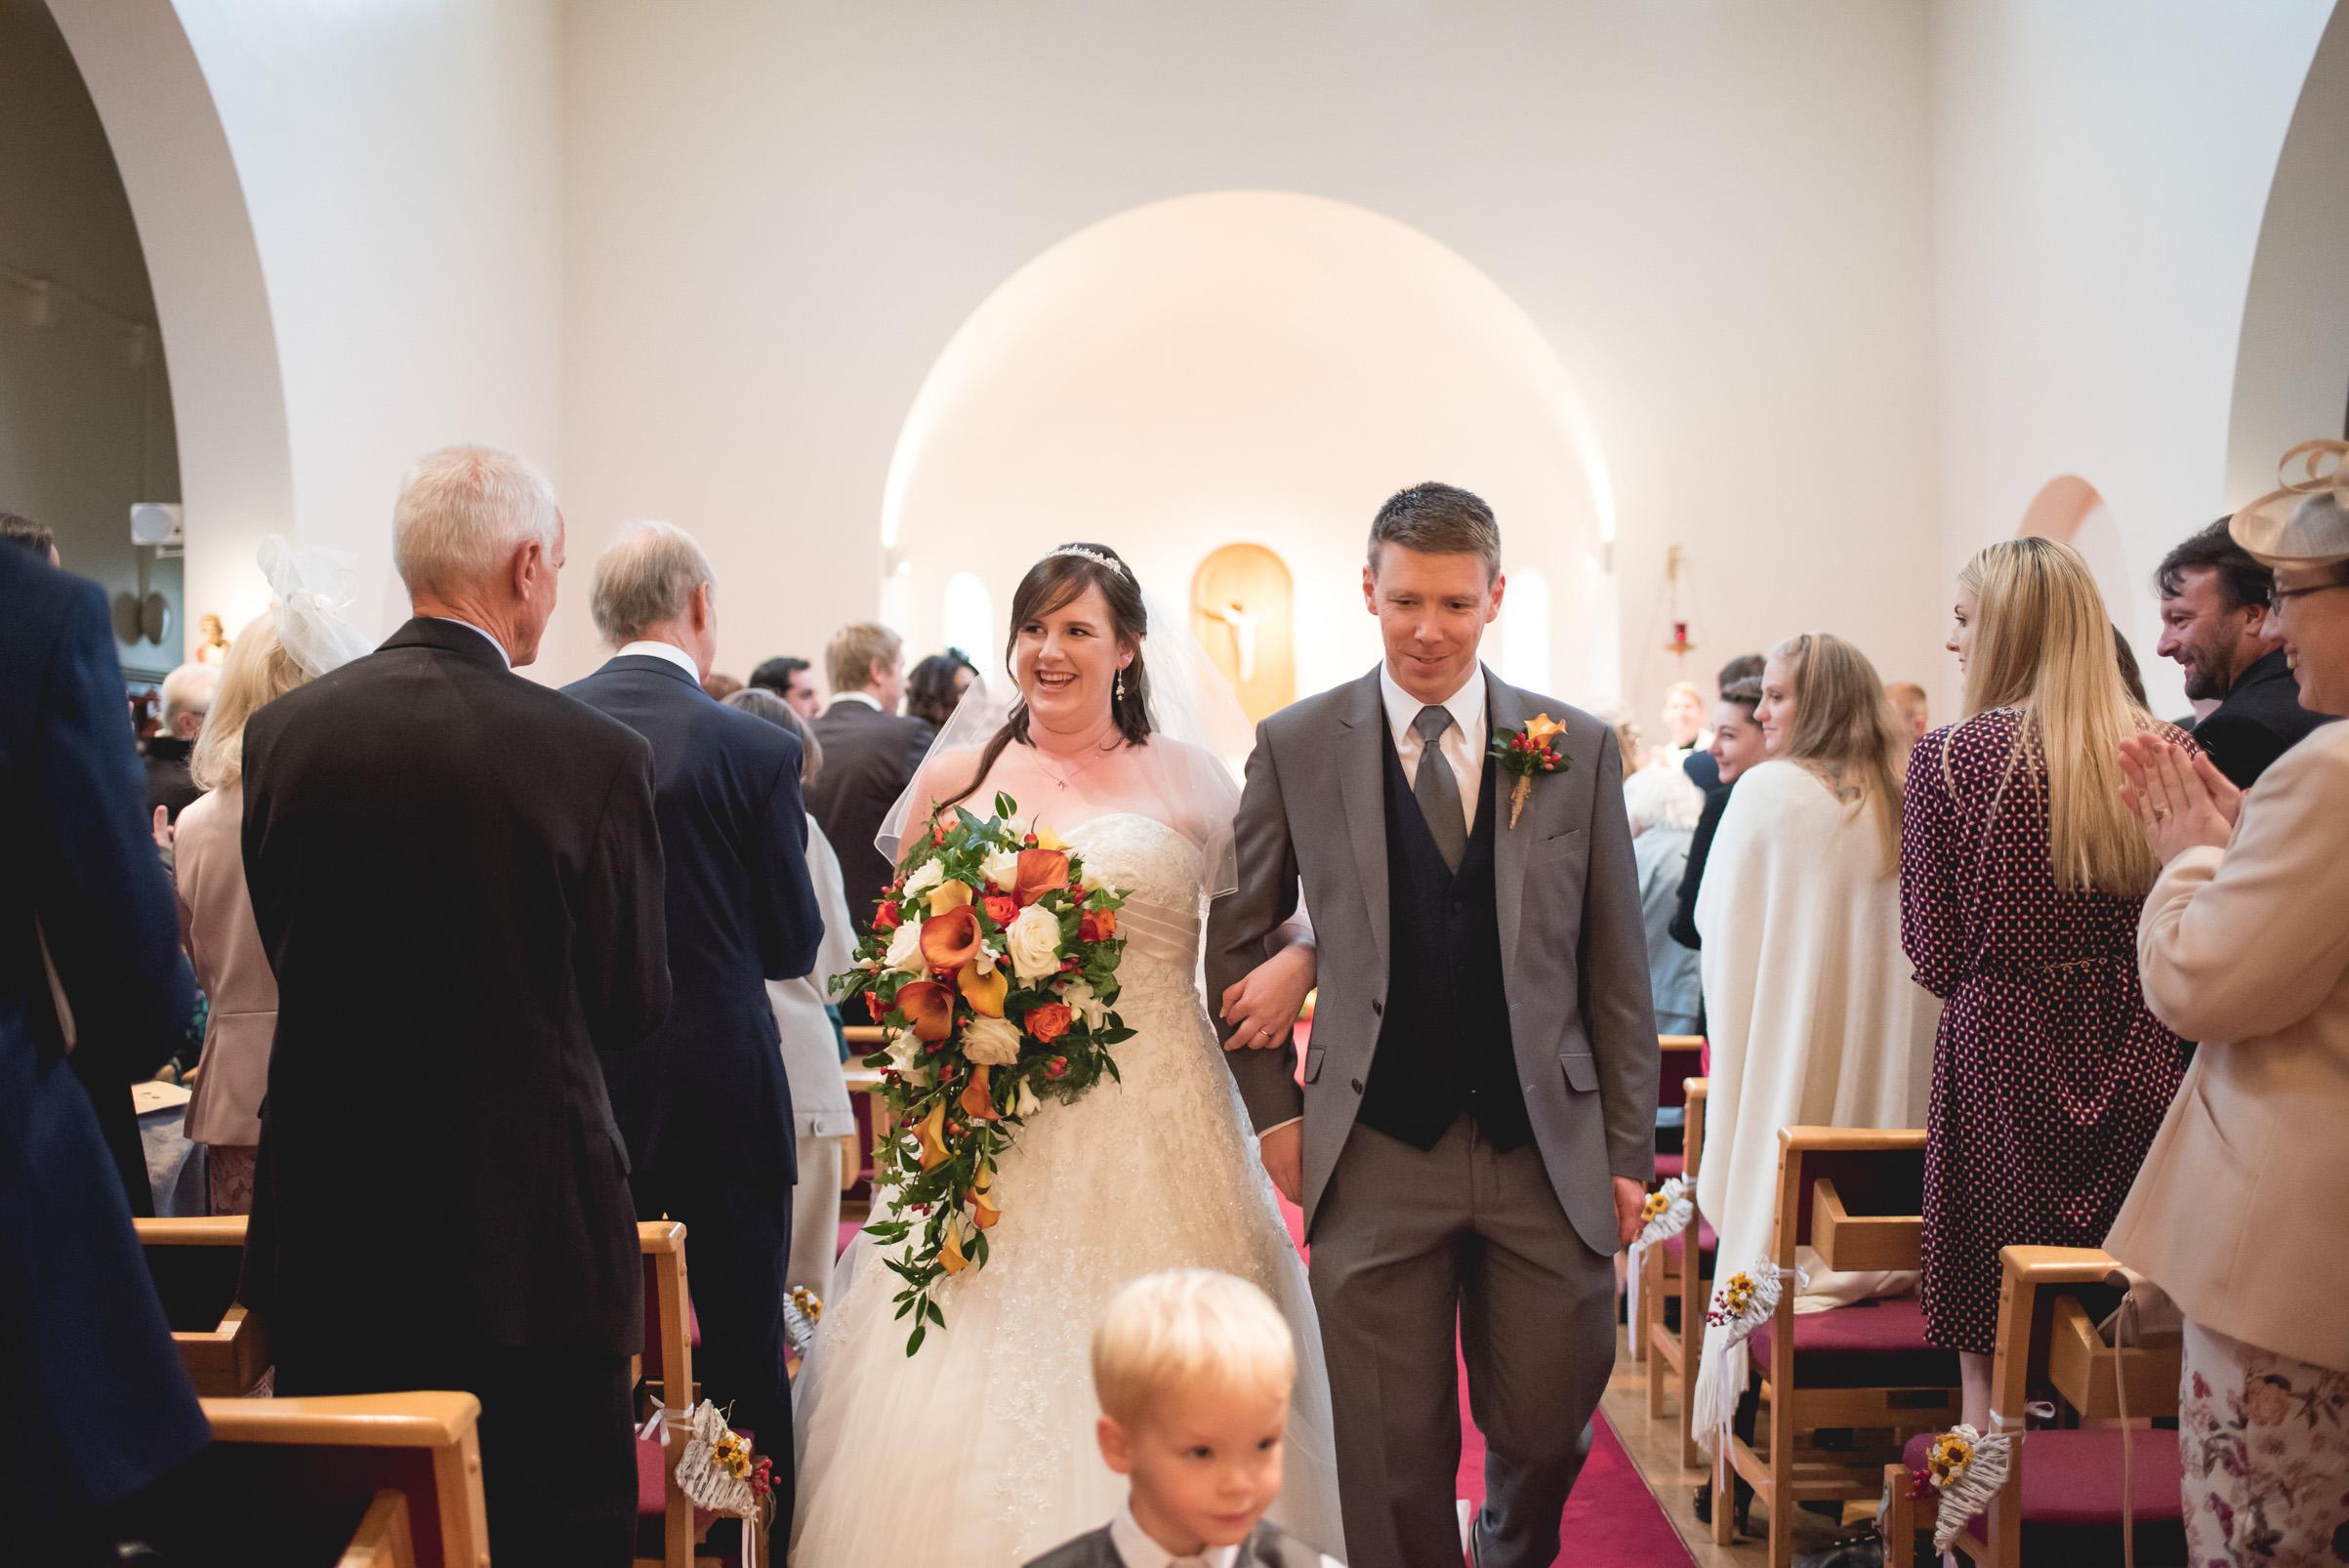 The+Fairlawns+wedding+Aldridge+StLukes+Church-105.jpg